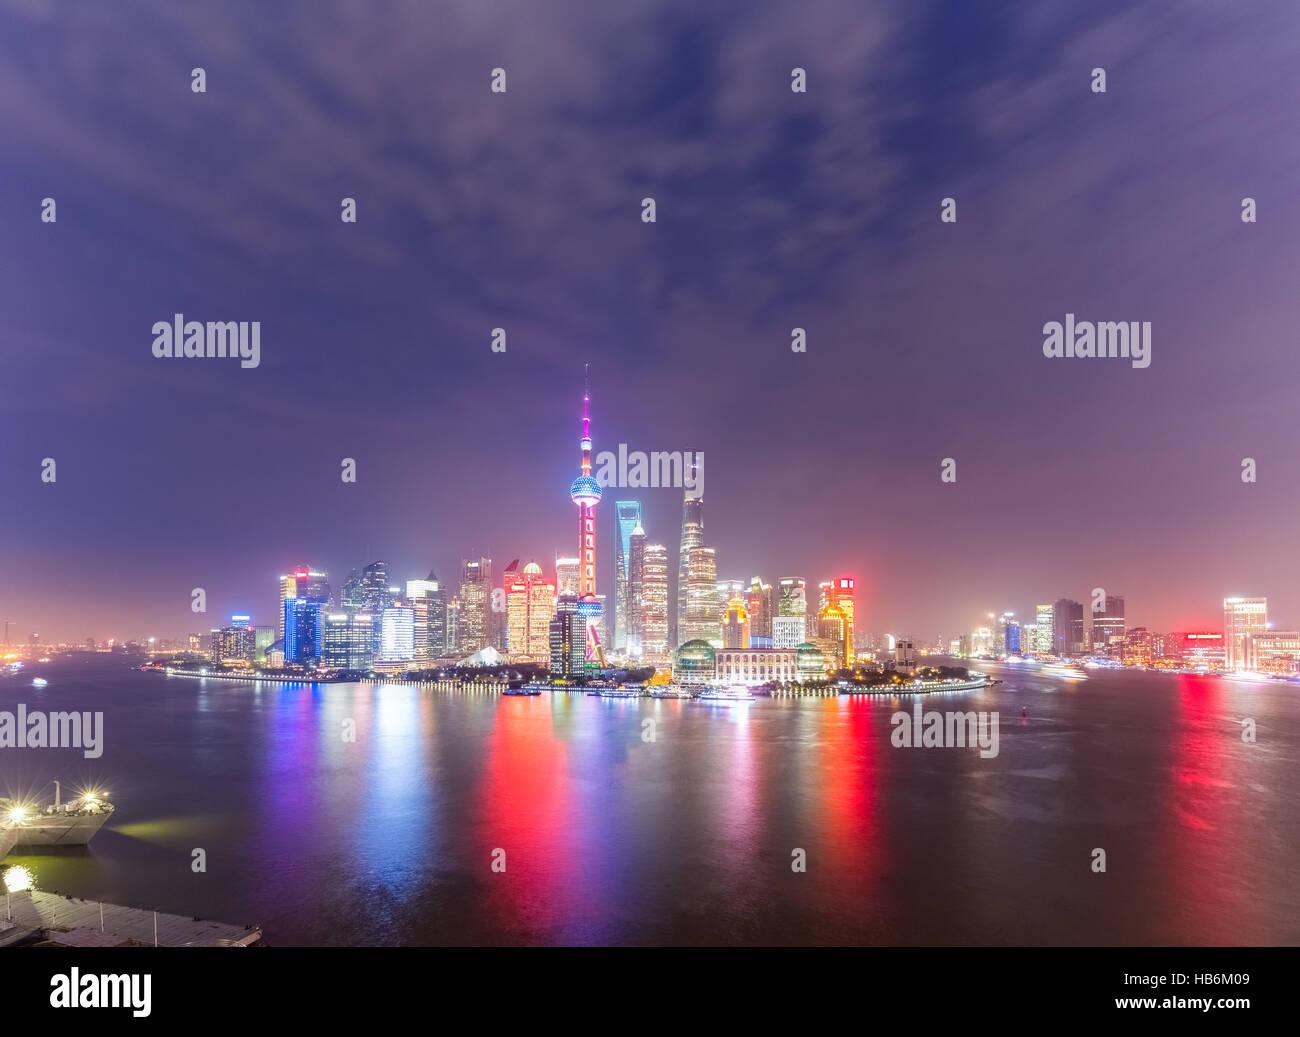 Shanghai stock exchange building stockfotos shanghai stock exchange building bilder alamy - Nasse fenster uber nacht ...